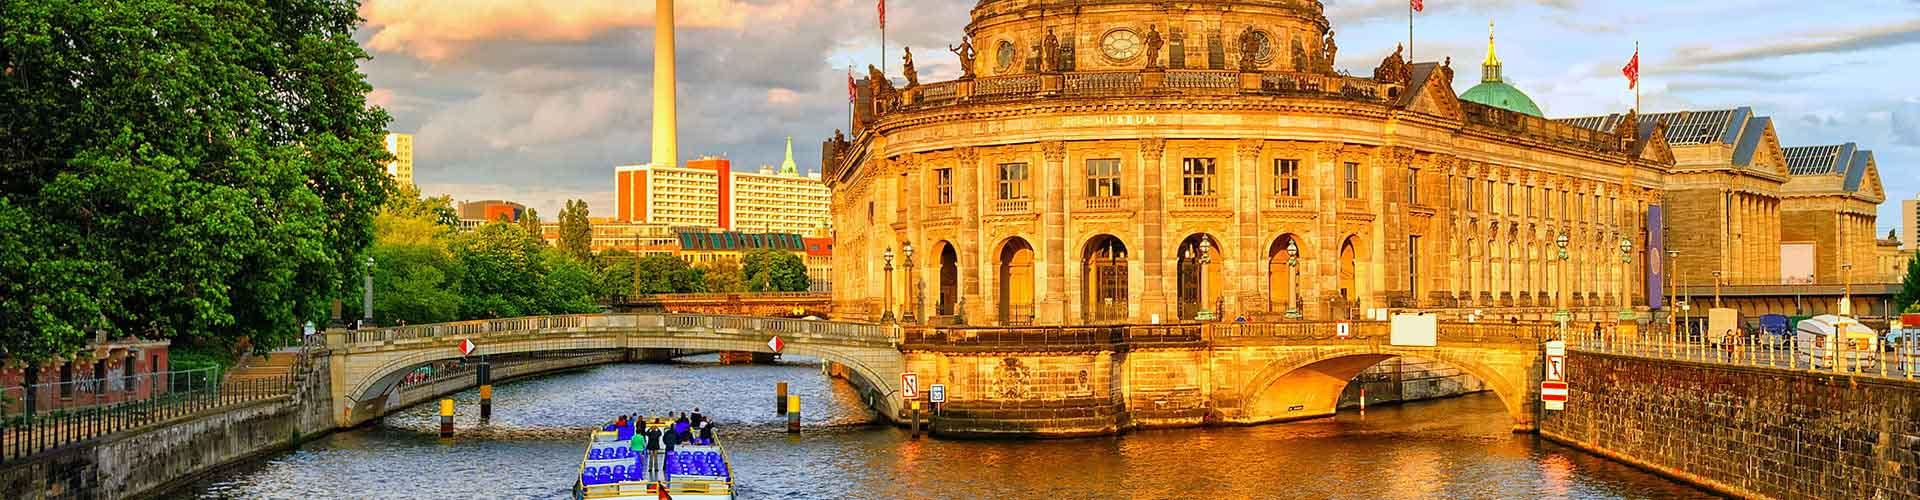 Berlín - Albergues en Berlín. Mapas de Berlín, Fotos y Comentarios para cada Albergue en Berlín.